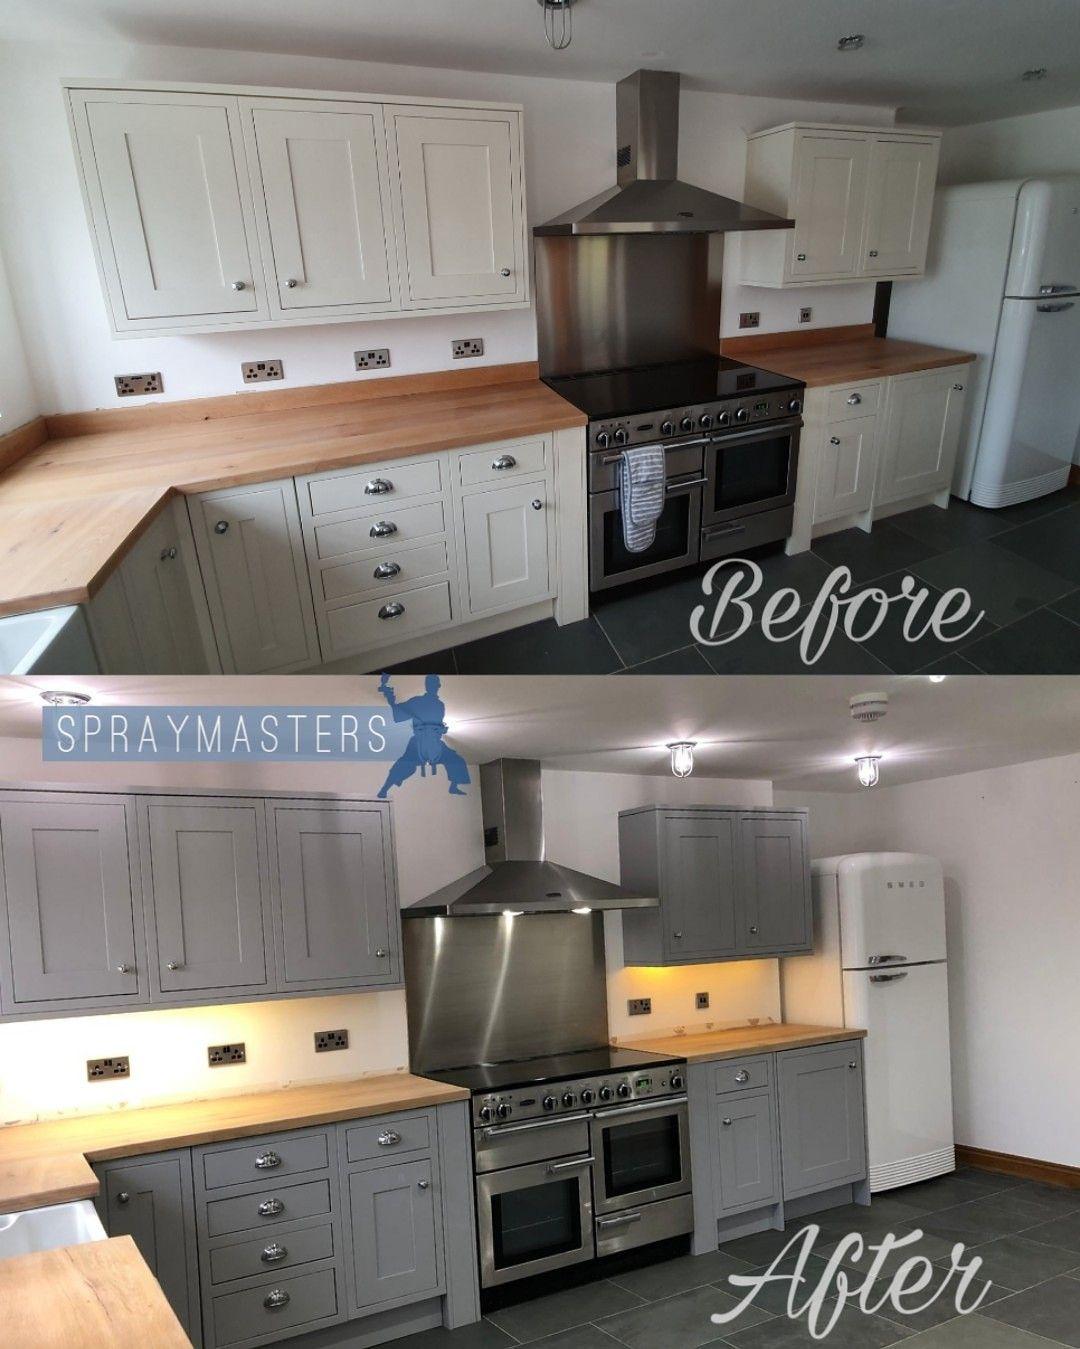 Kitchen Cabinet Spraying Upcycled Kitchen Cabinets Upcycle Kitchen Kitchen Cabinets